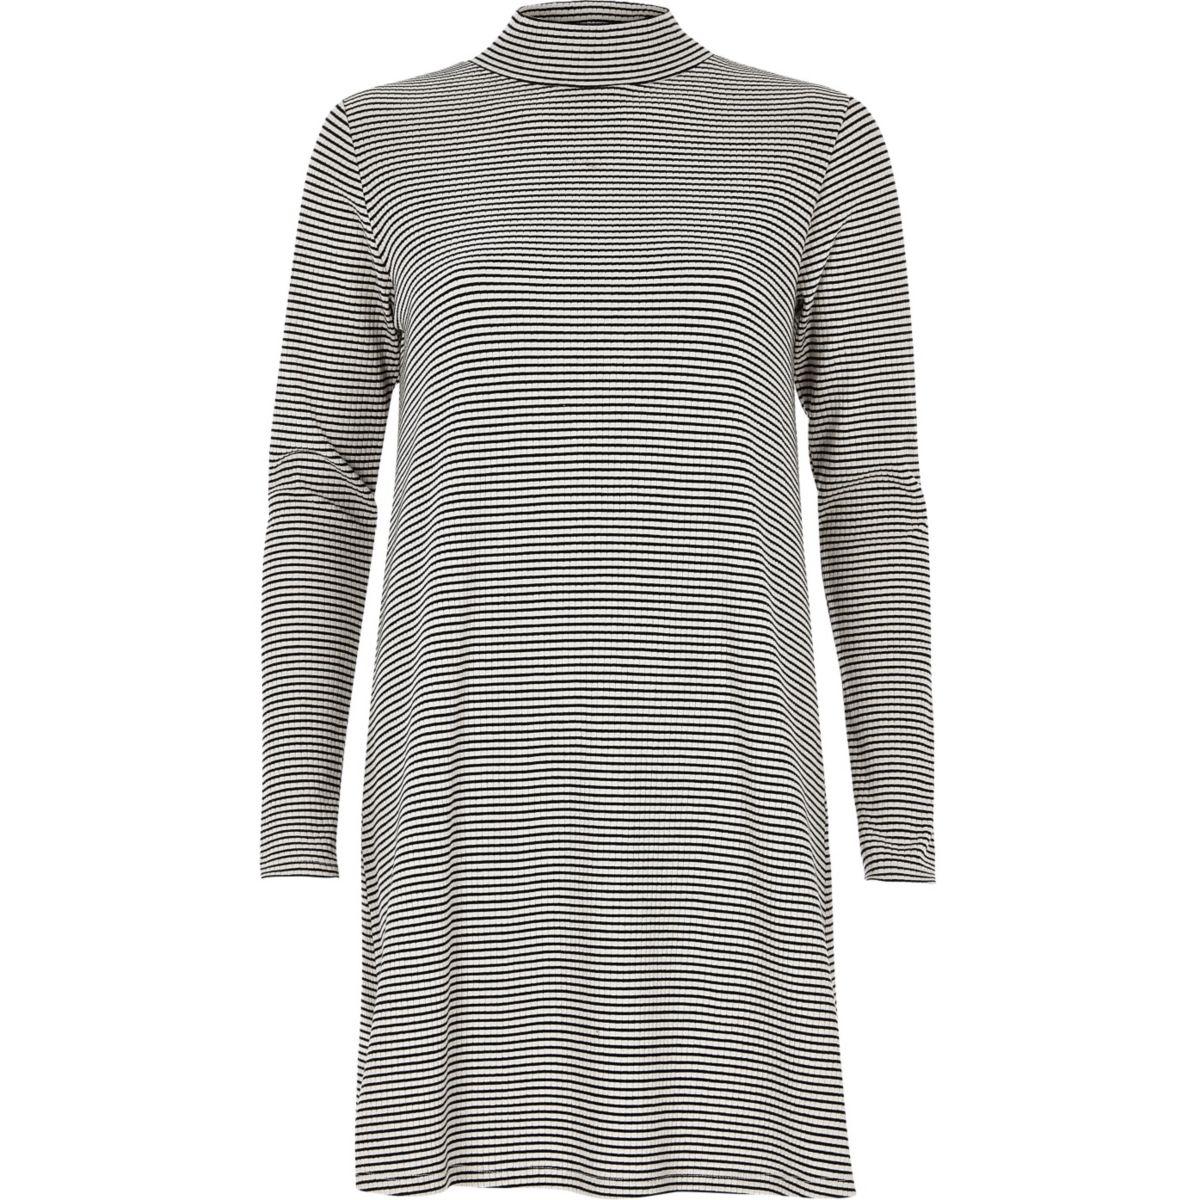 Black and white stripe turtleneck dress